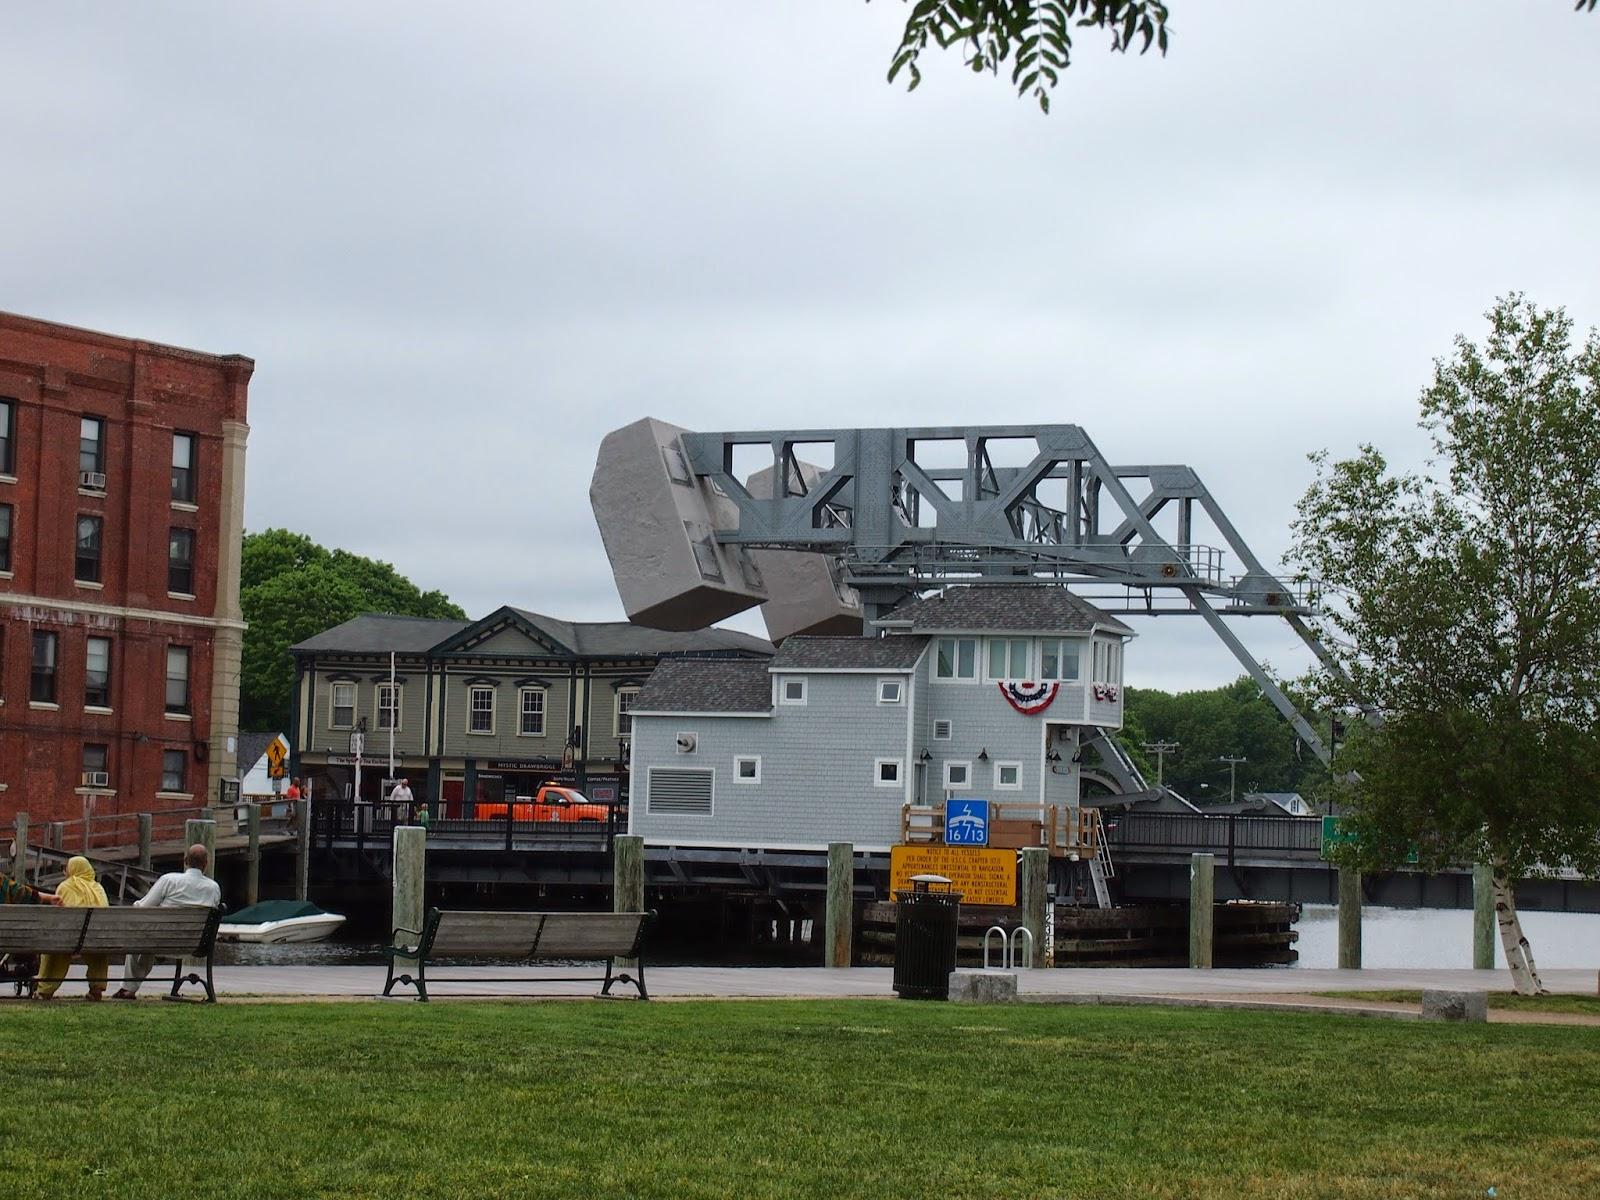 a side view of the Mystic River Bascule Bridge